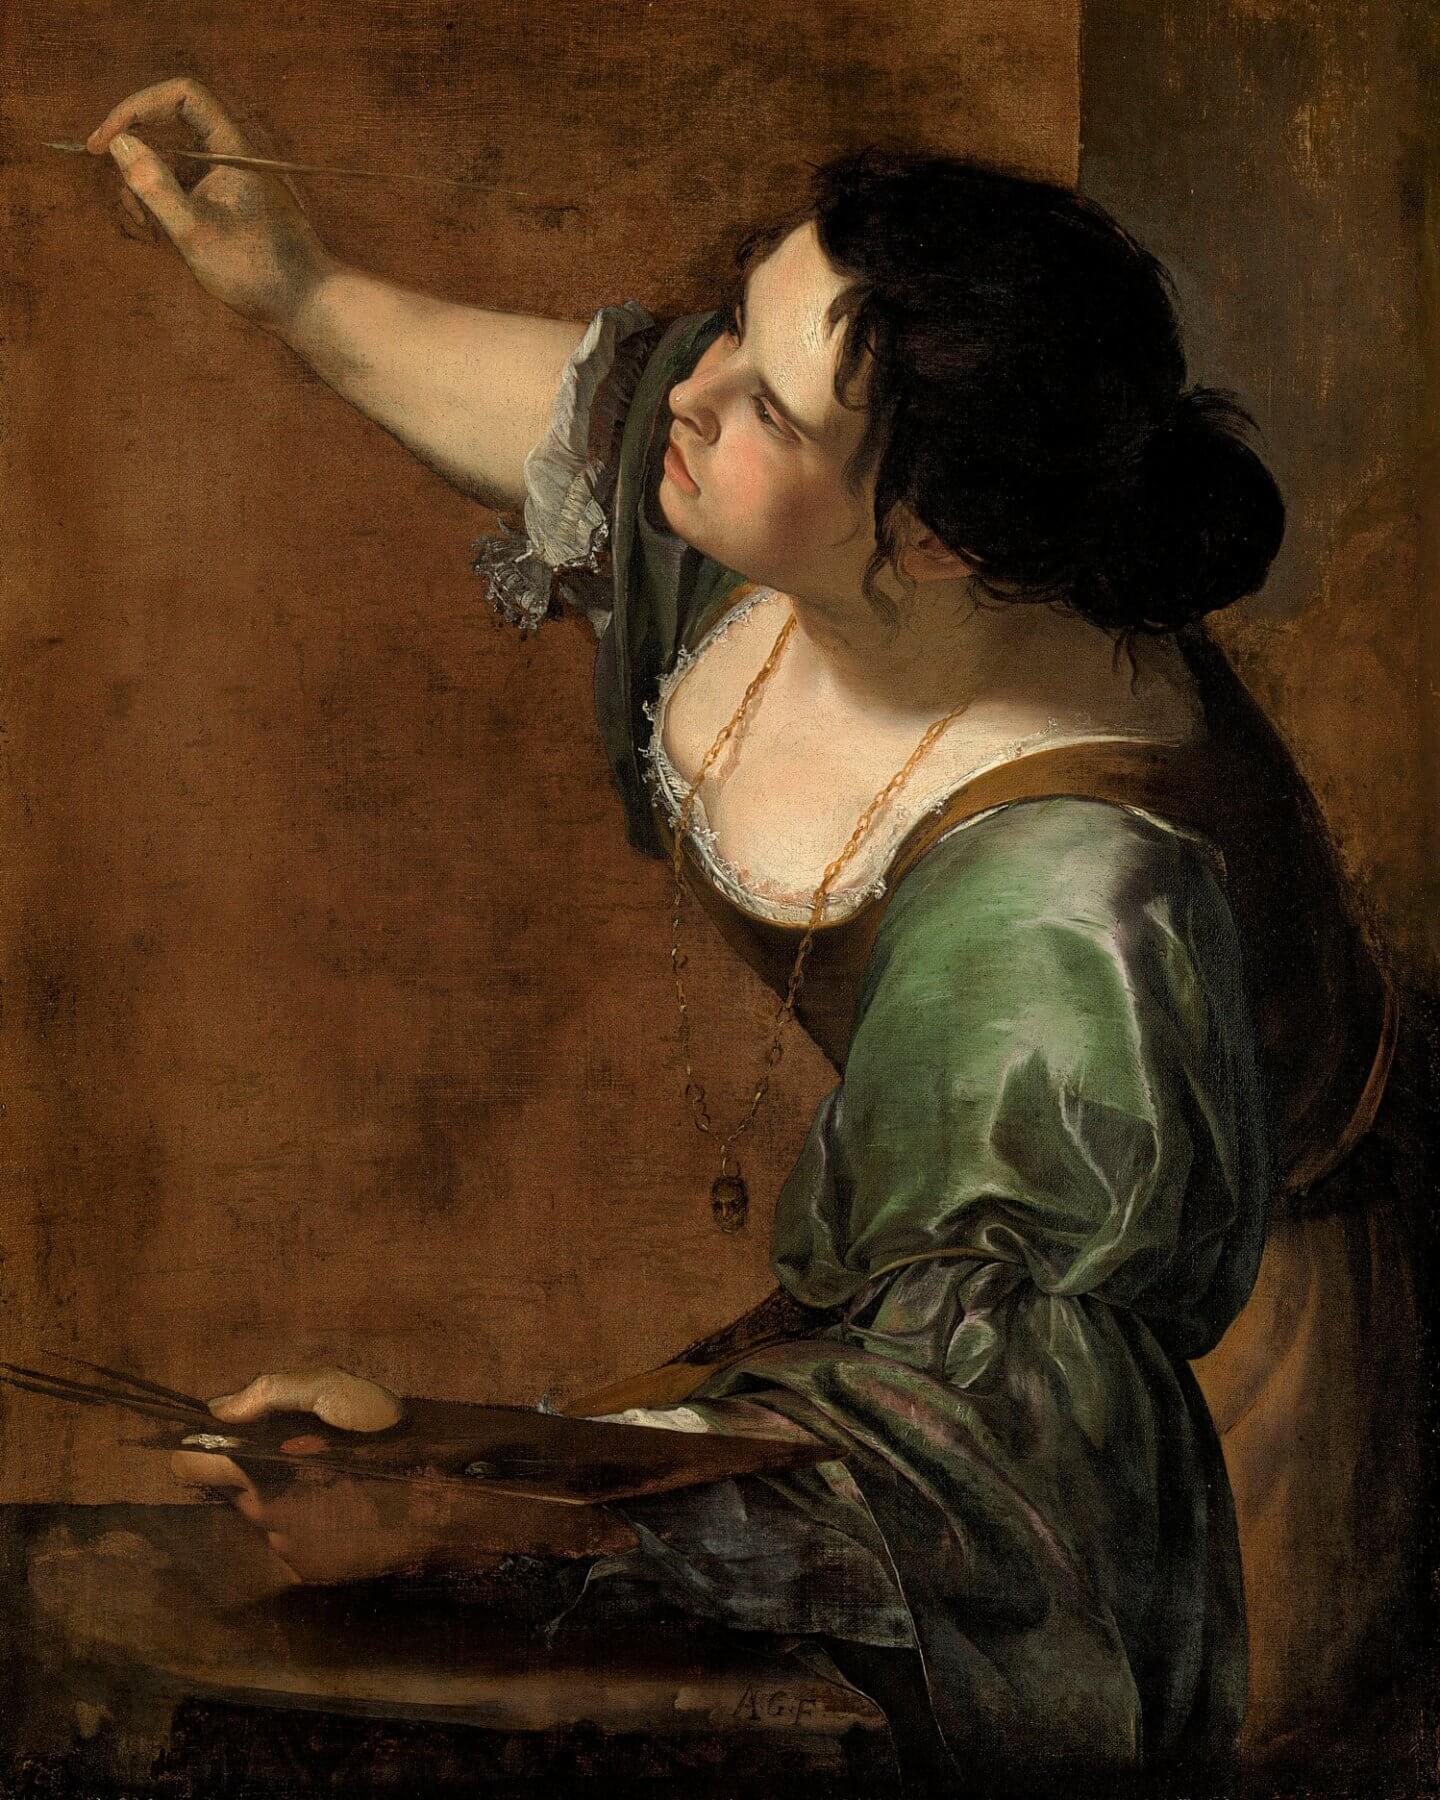 Артемизия Джентилески. Автопортрет в виде аллегории Живописи. 1630-е. Холст, масло. Королевское собрание, Виндзор